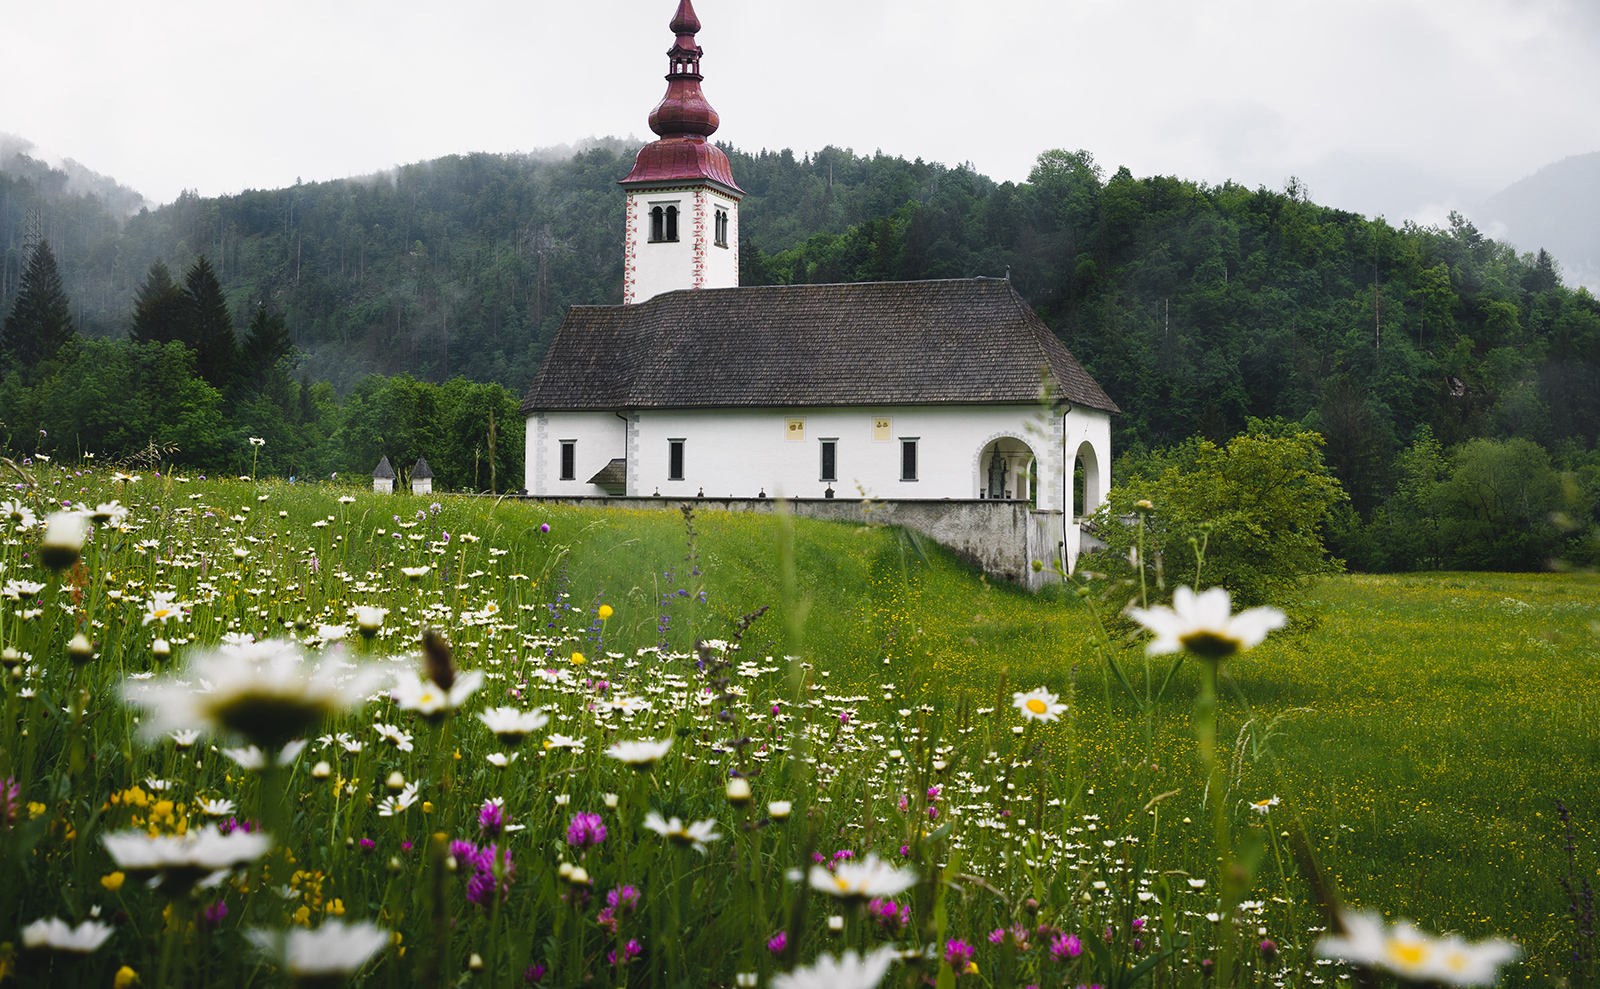 a Balkan church in a field of wildflowers